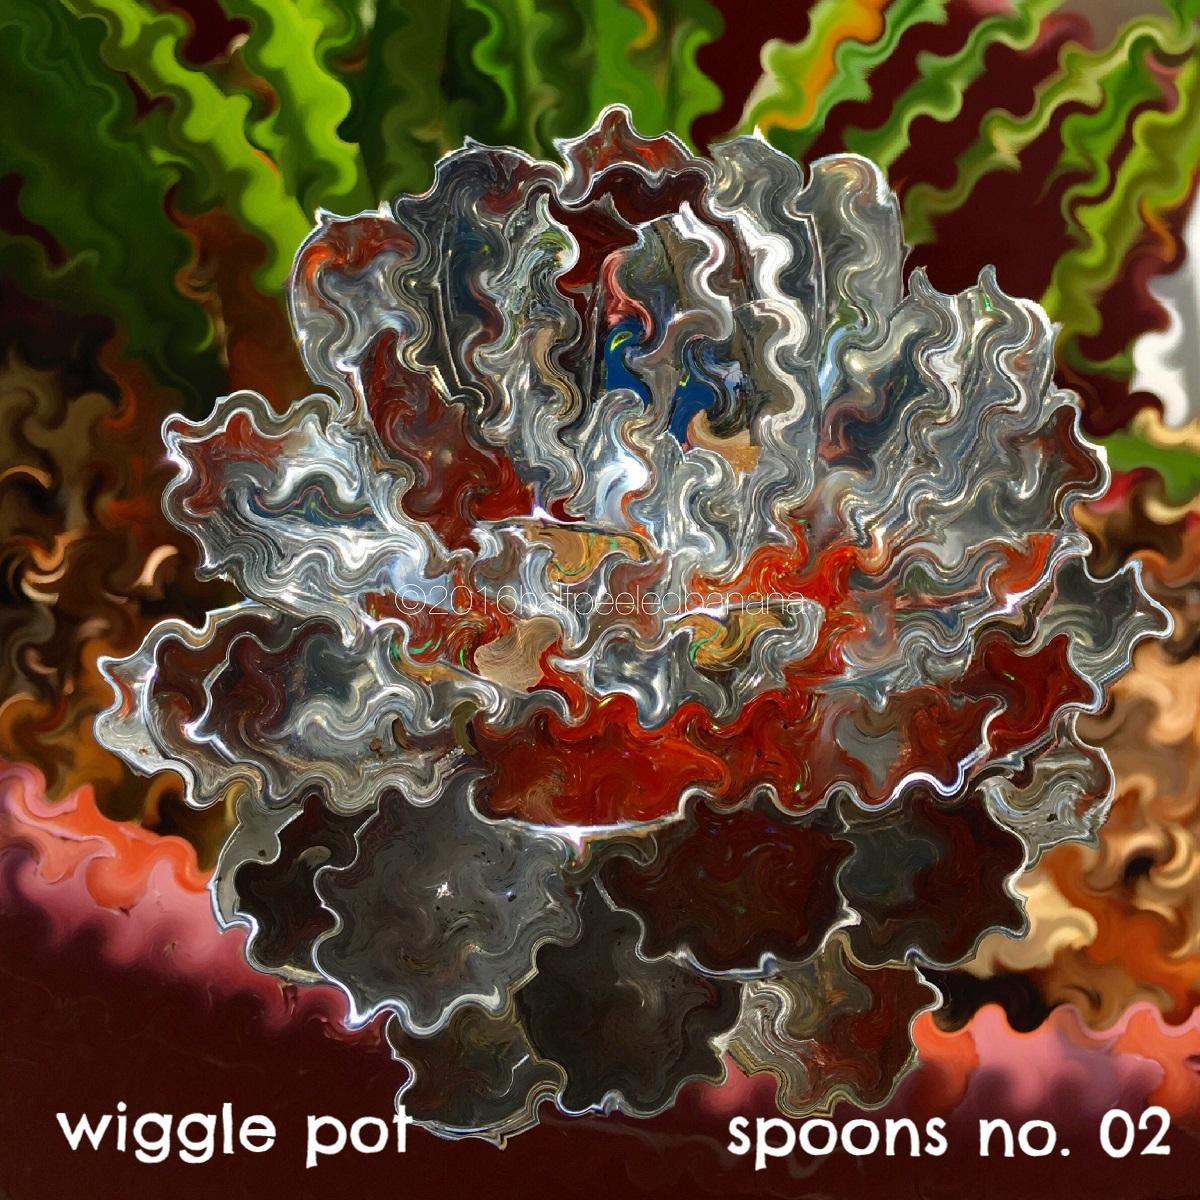 wiggle pot